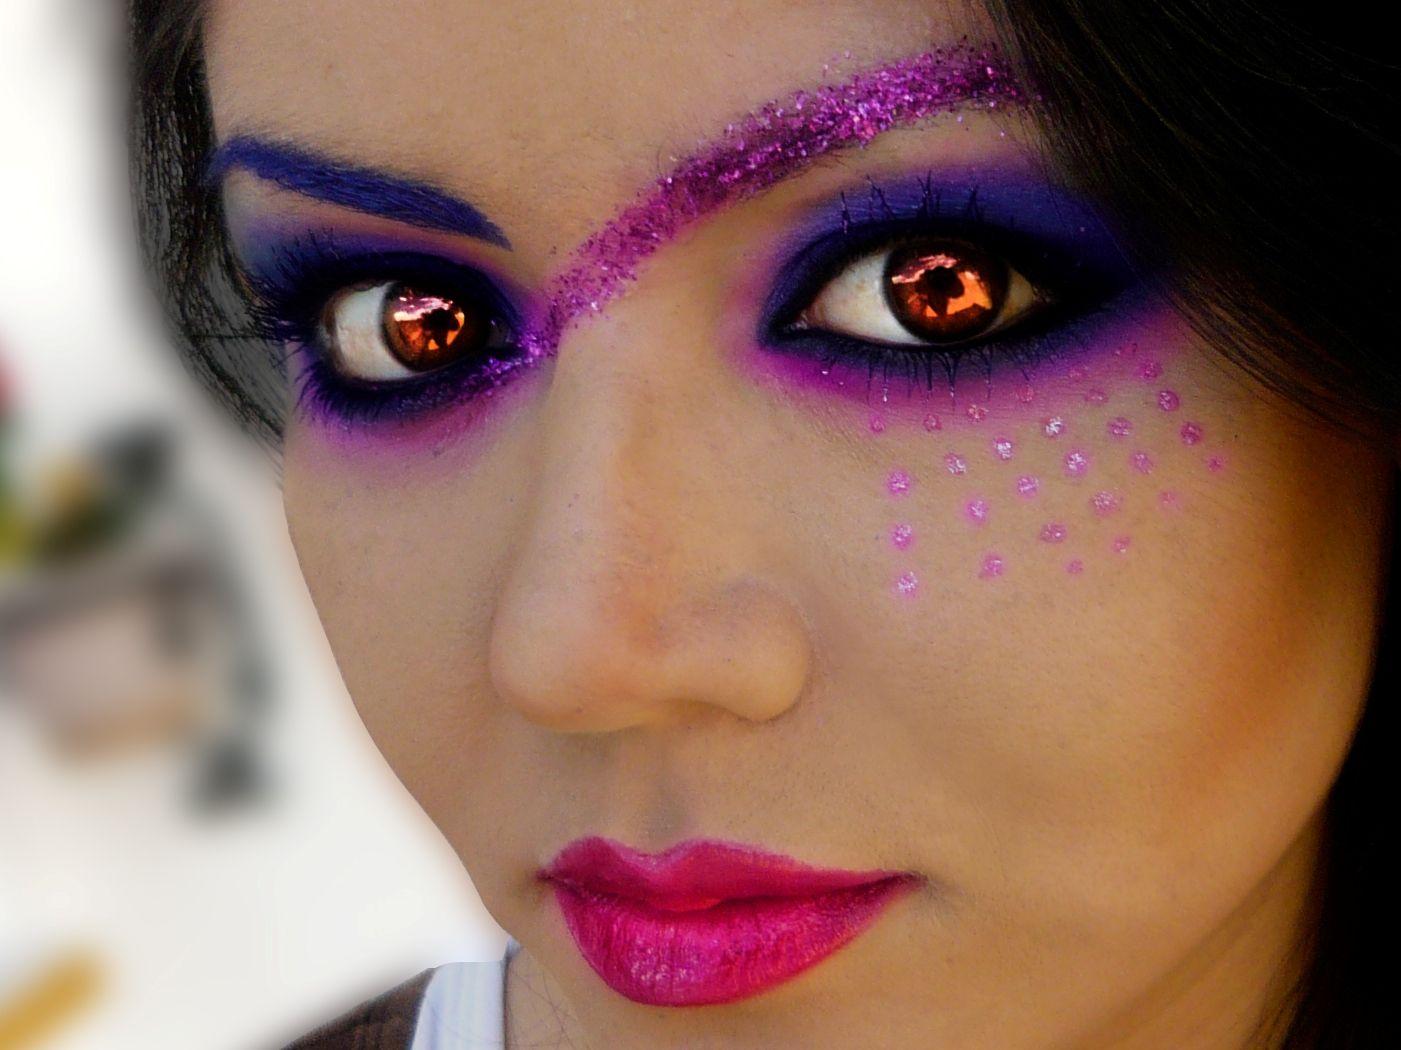 Fantasy make up maquillaje de fantasia gabriela zehavi model